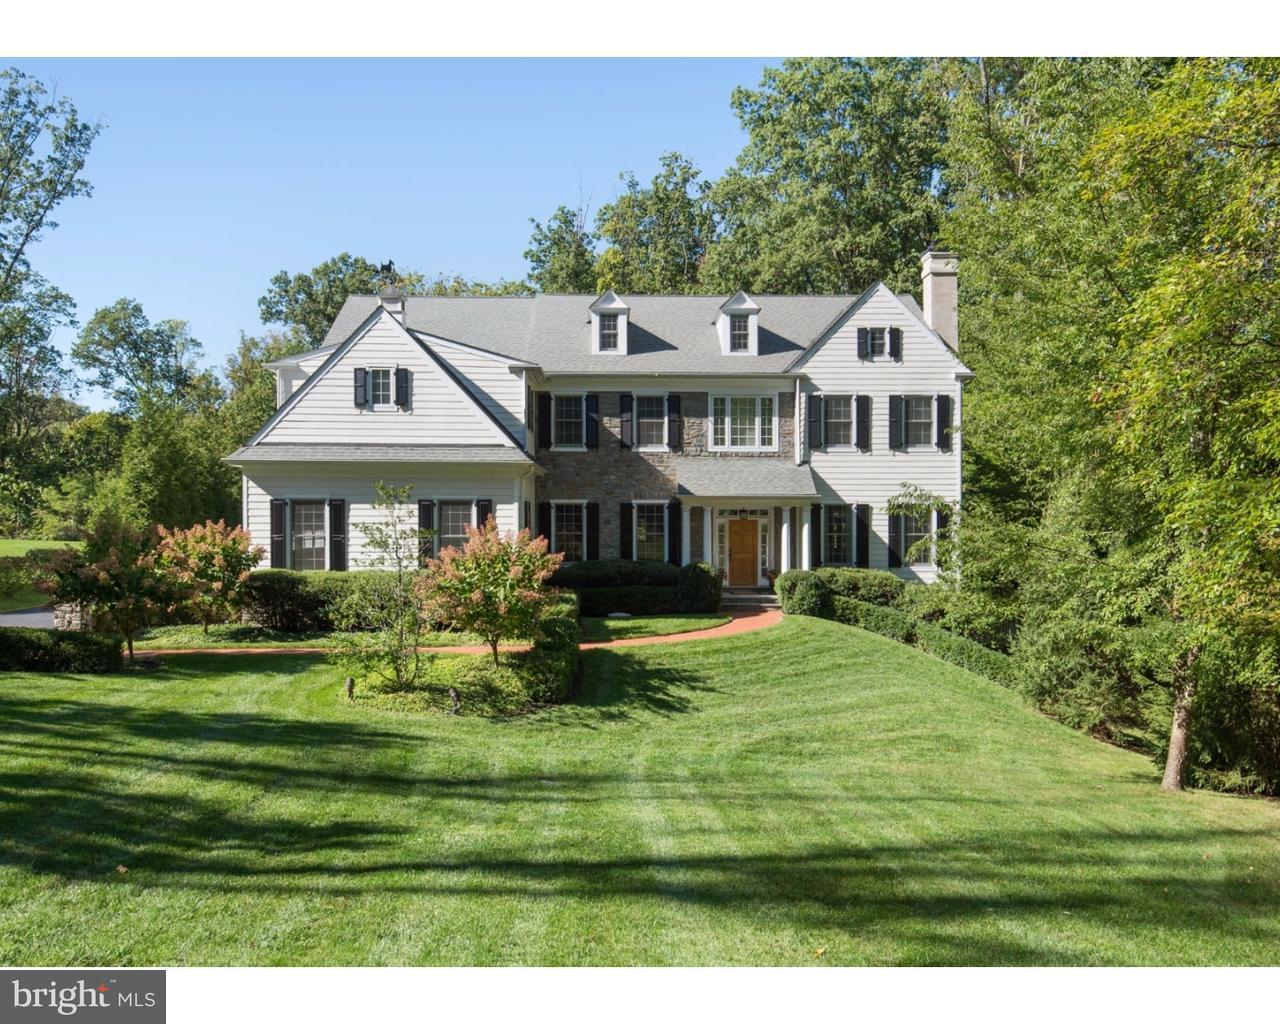 Single Family Home for Sale at 1633 MAPLE Avenue Tredyffrin, Pennsylvania 19301 United States